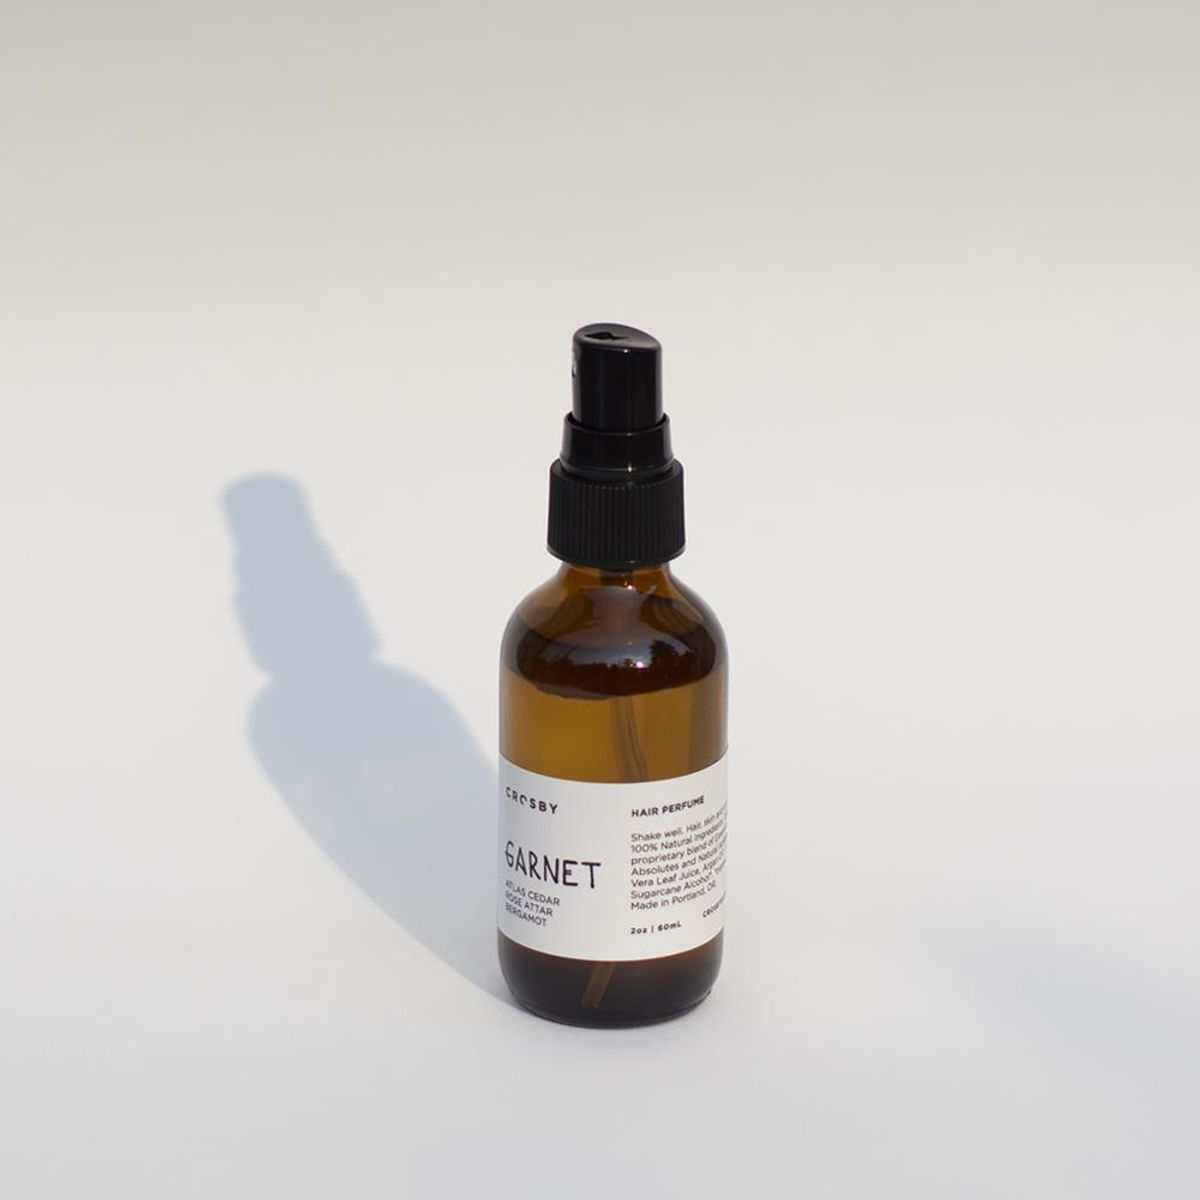 Hair Perfume in Garnet